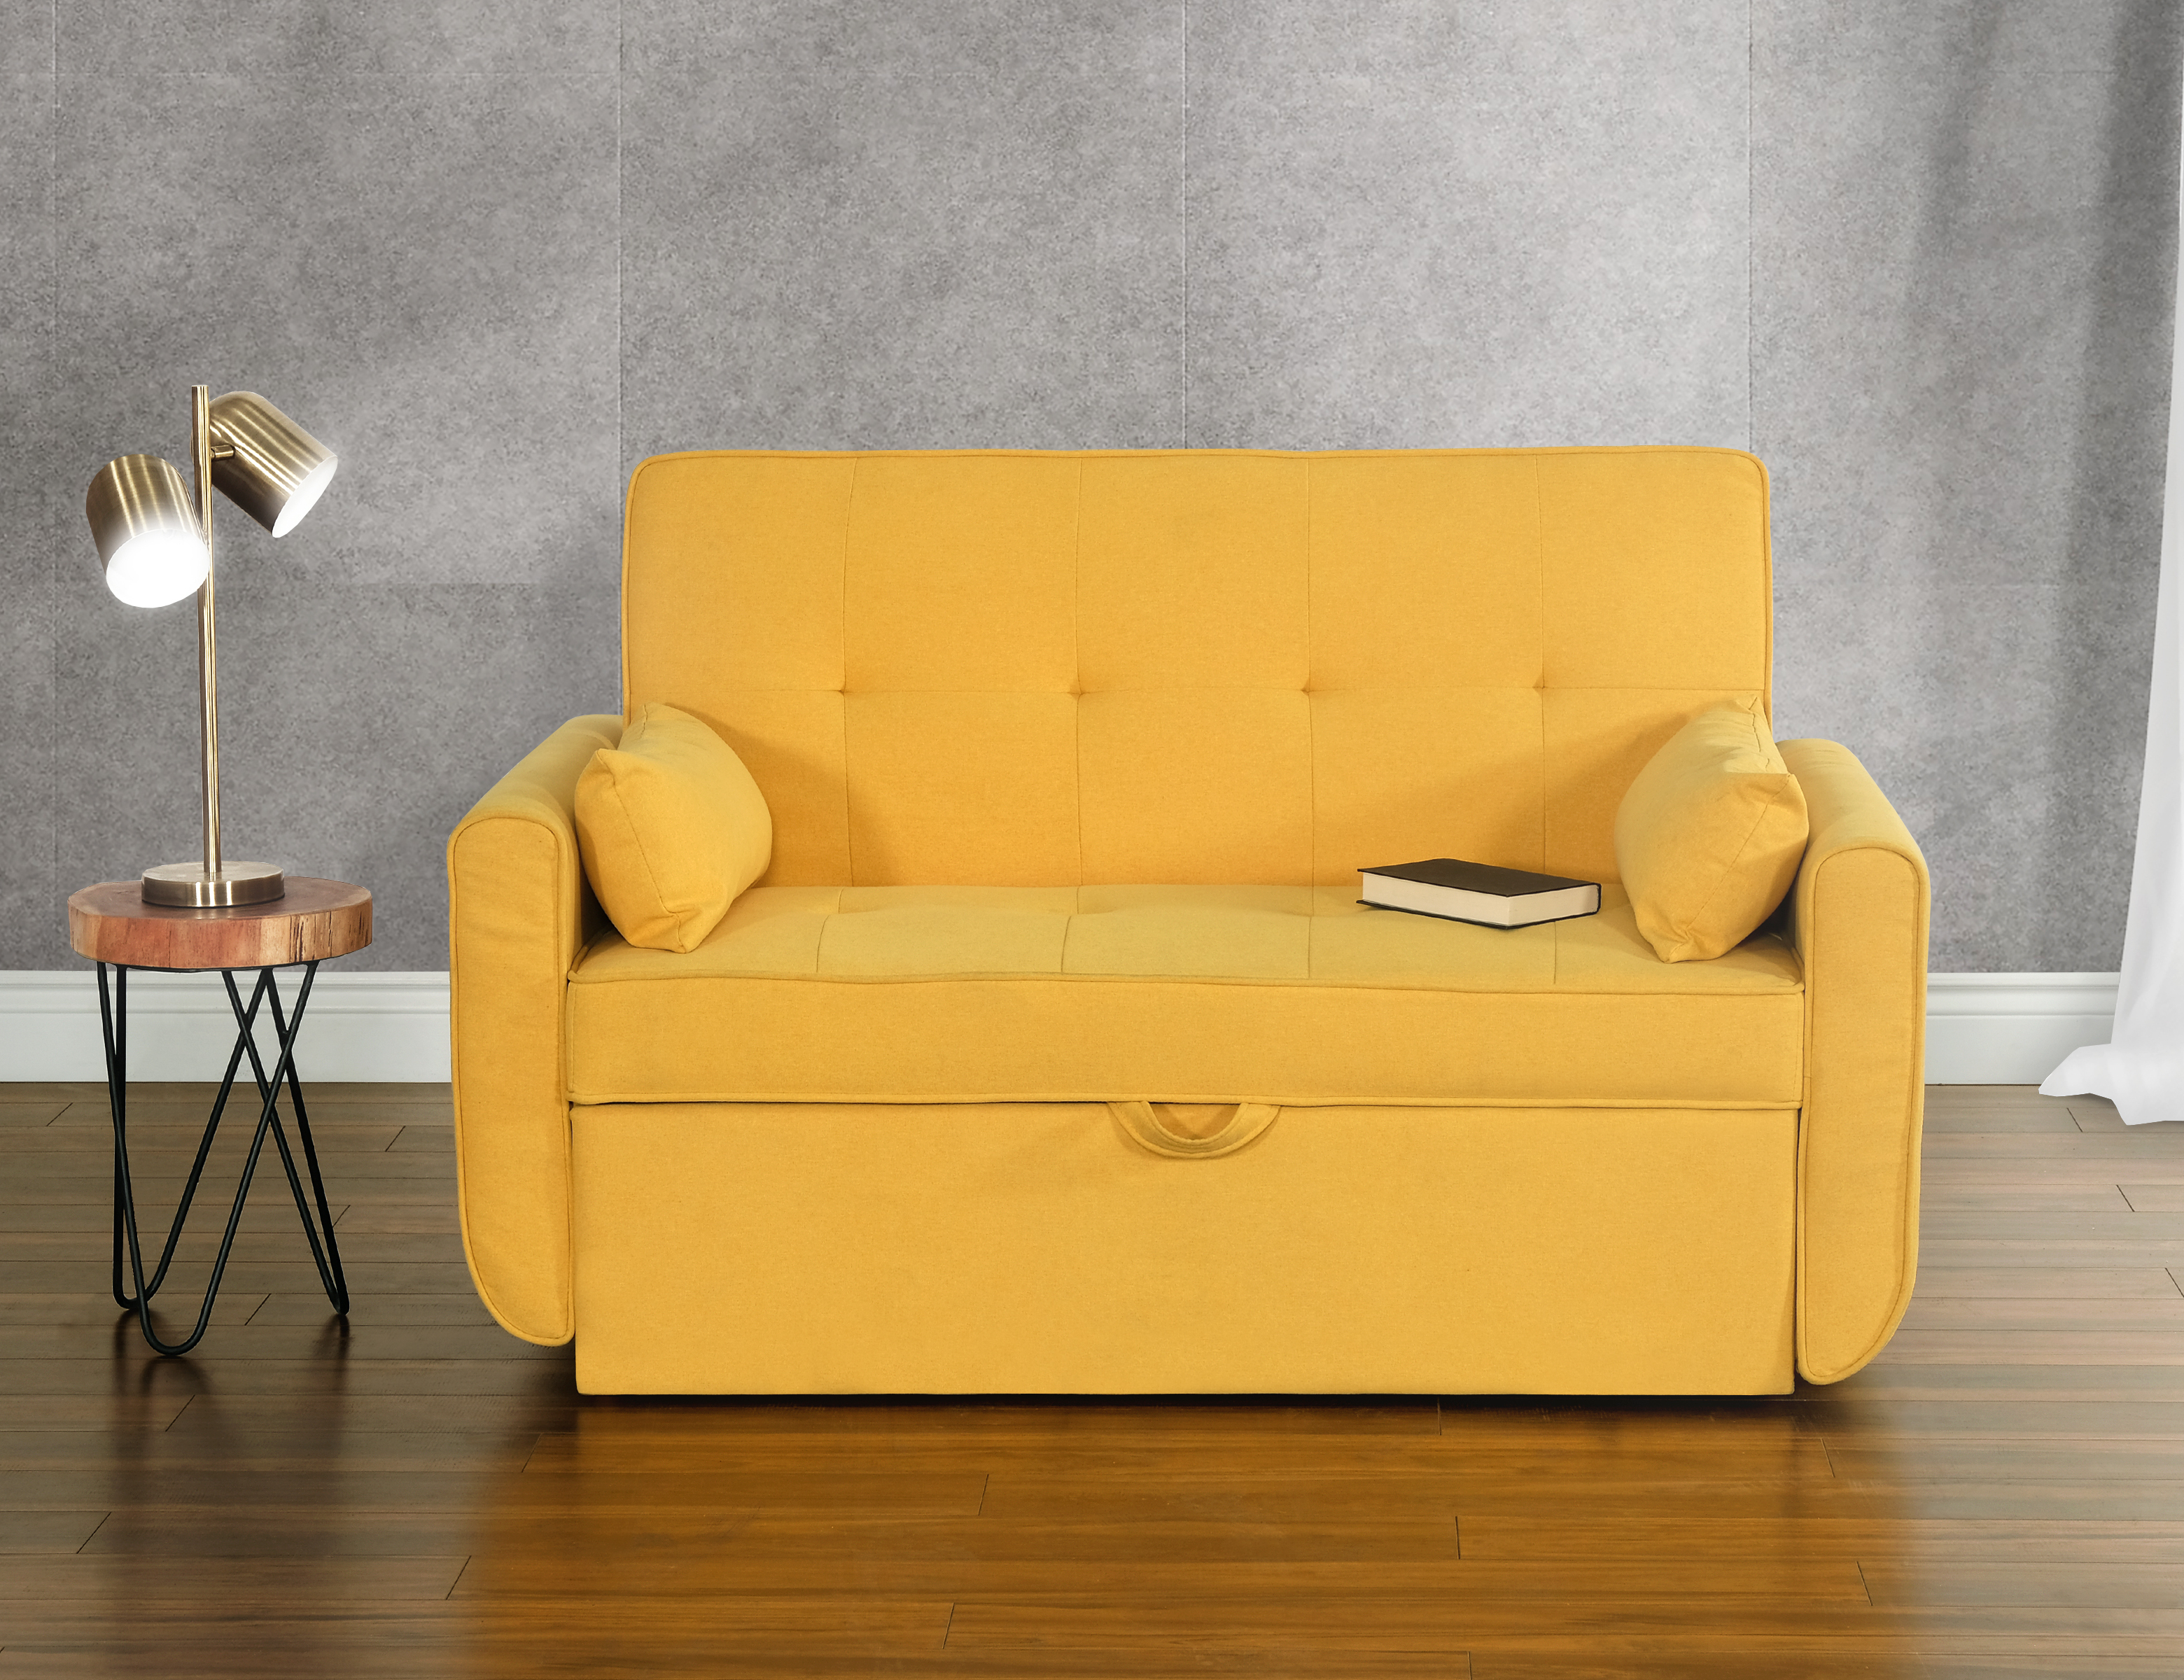 22779 – Sofa Bed